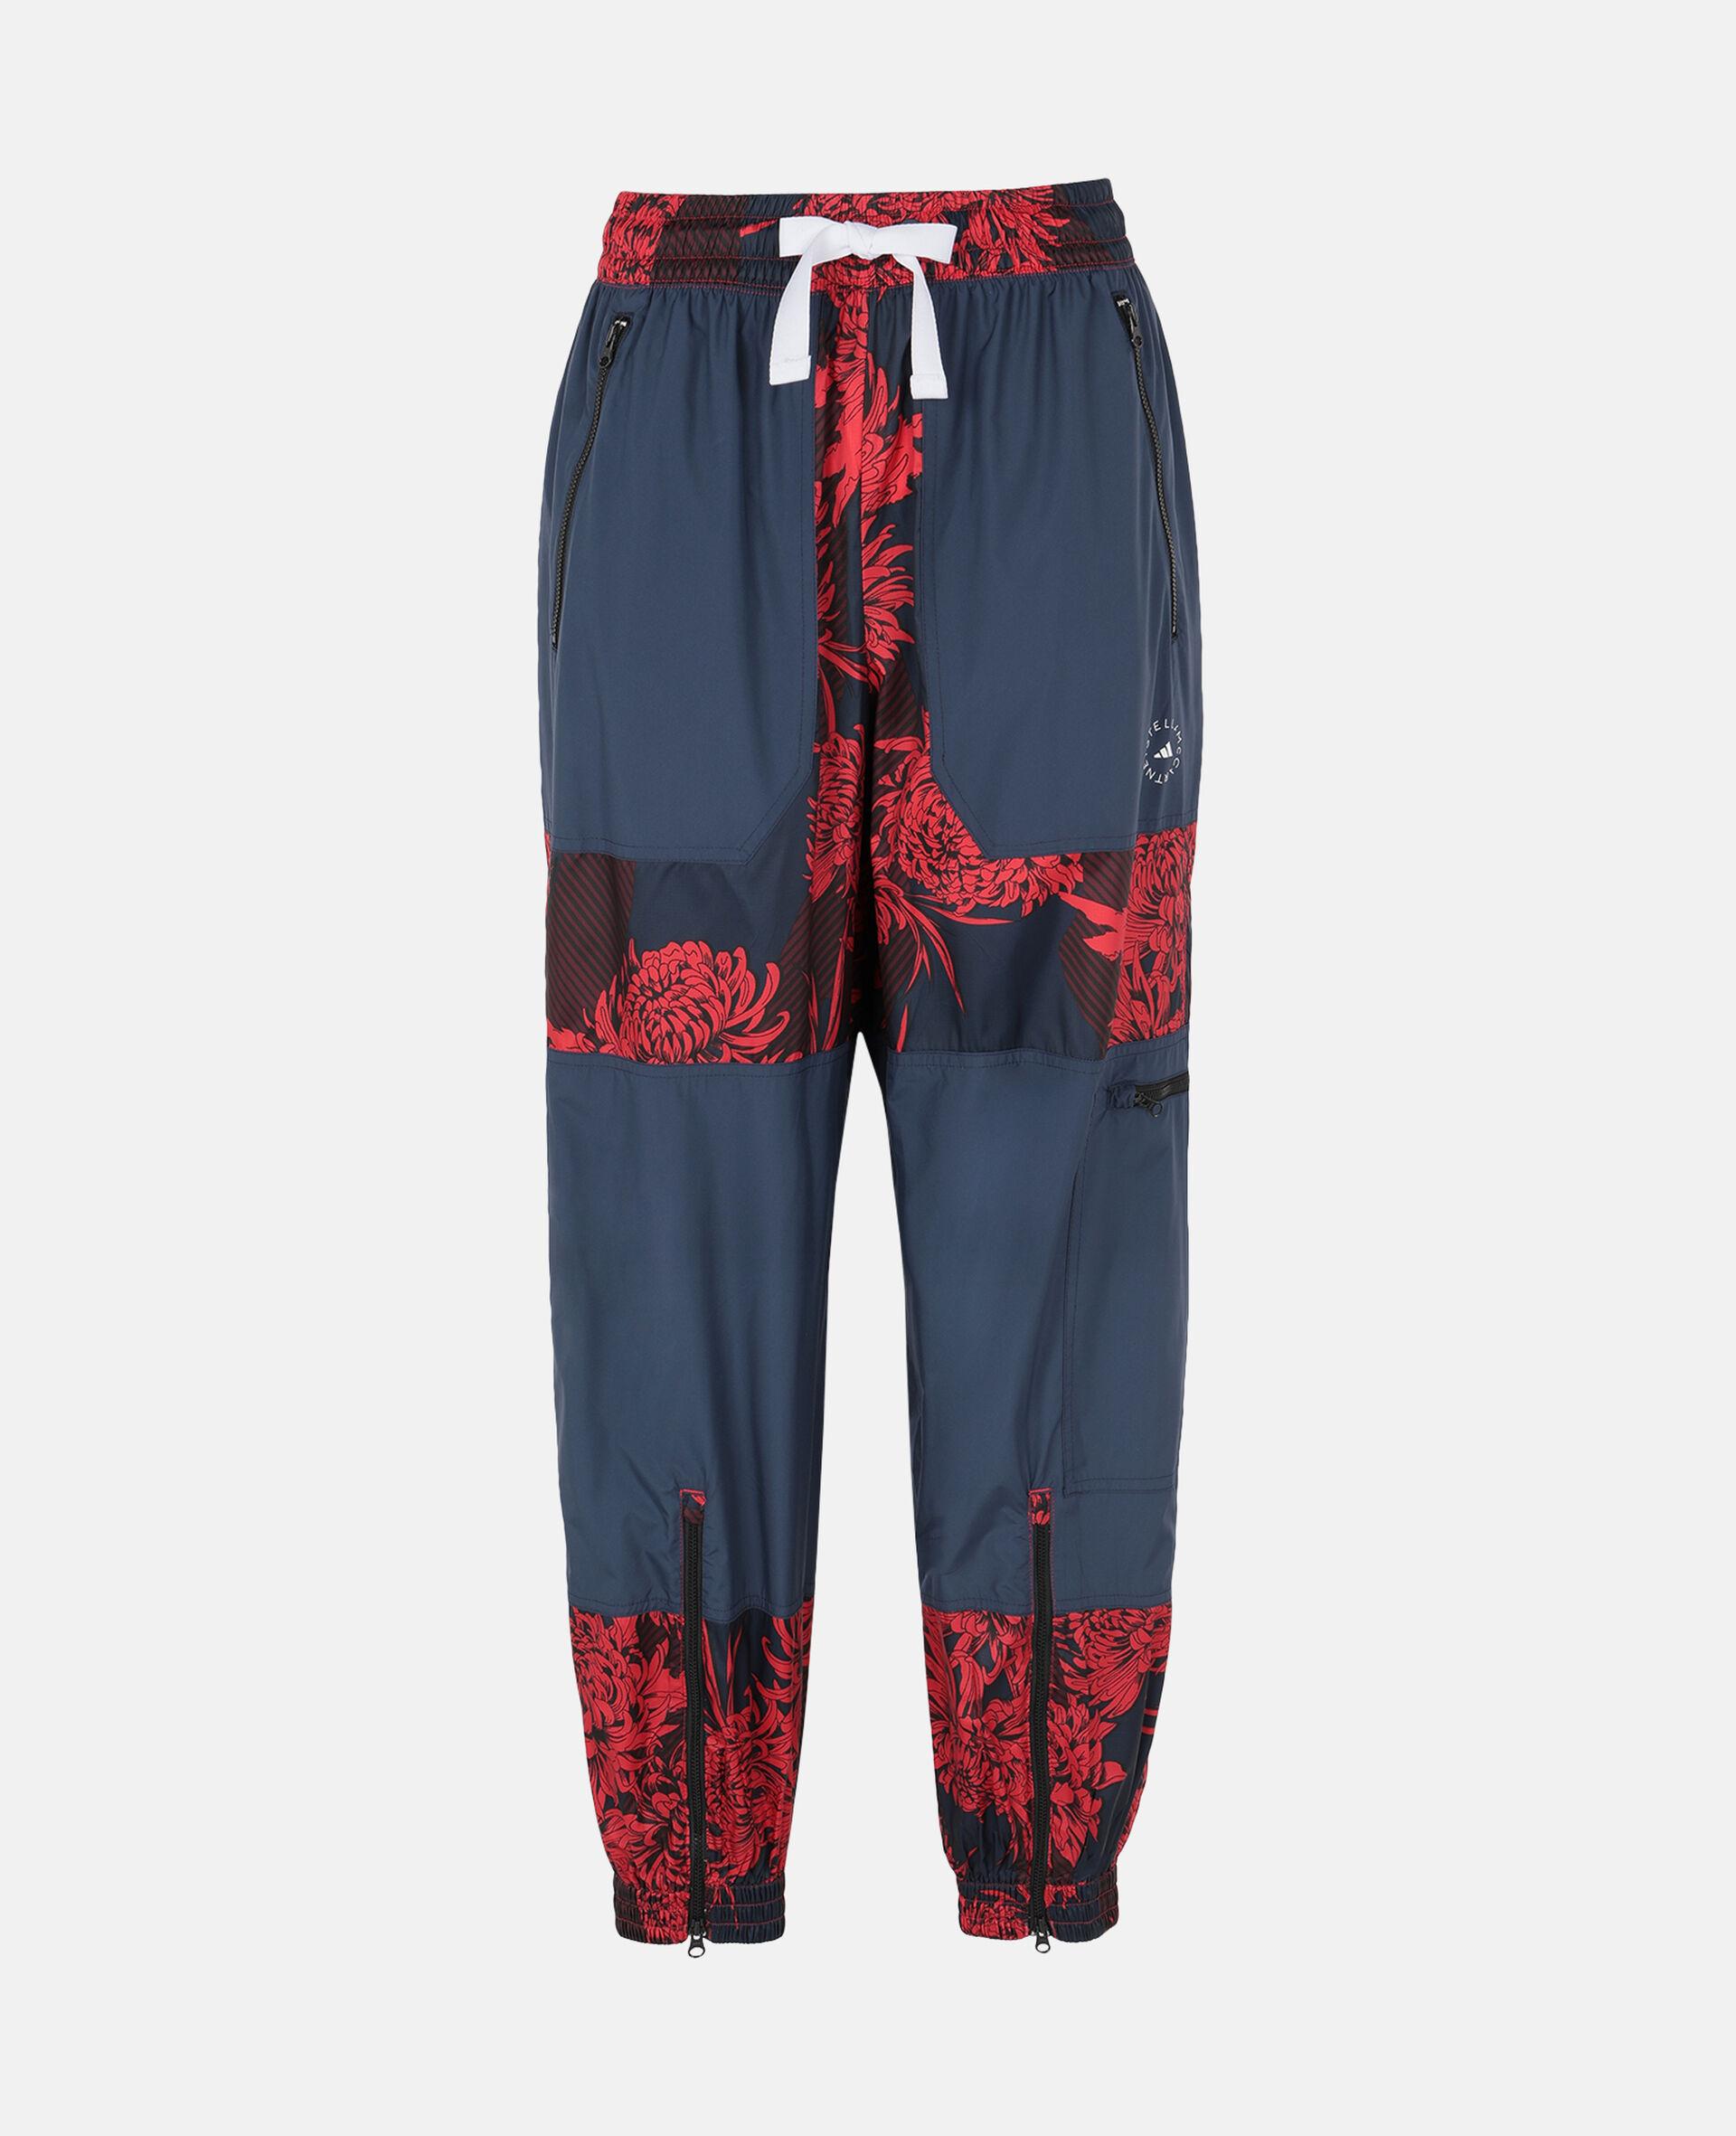 Future Playground 机织 Training 裤装-红色-large image number 0